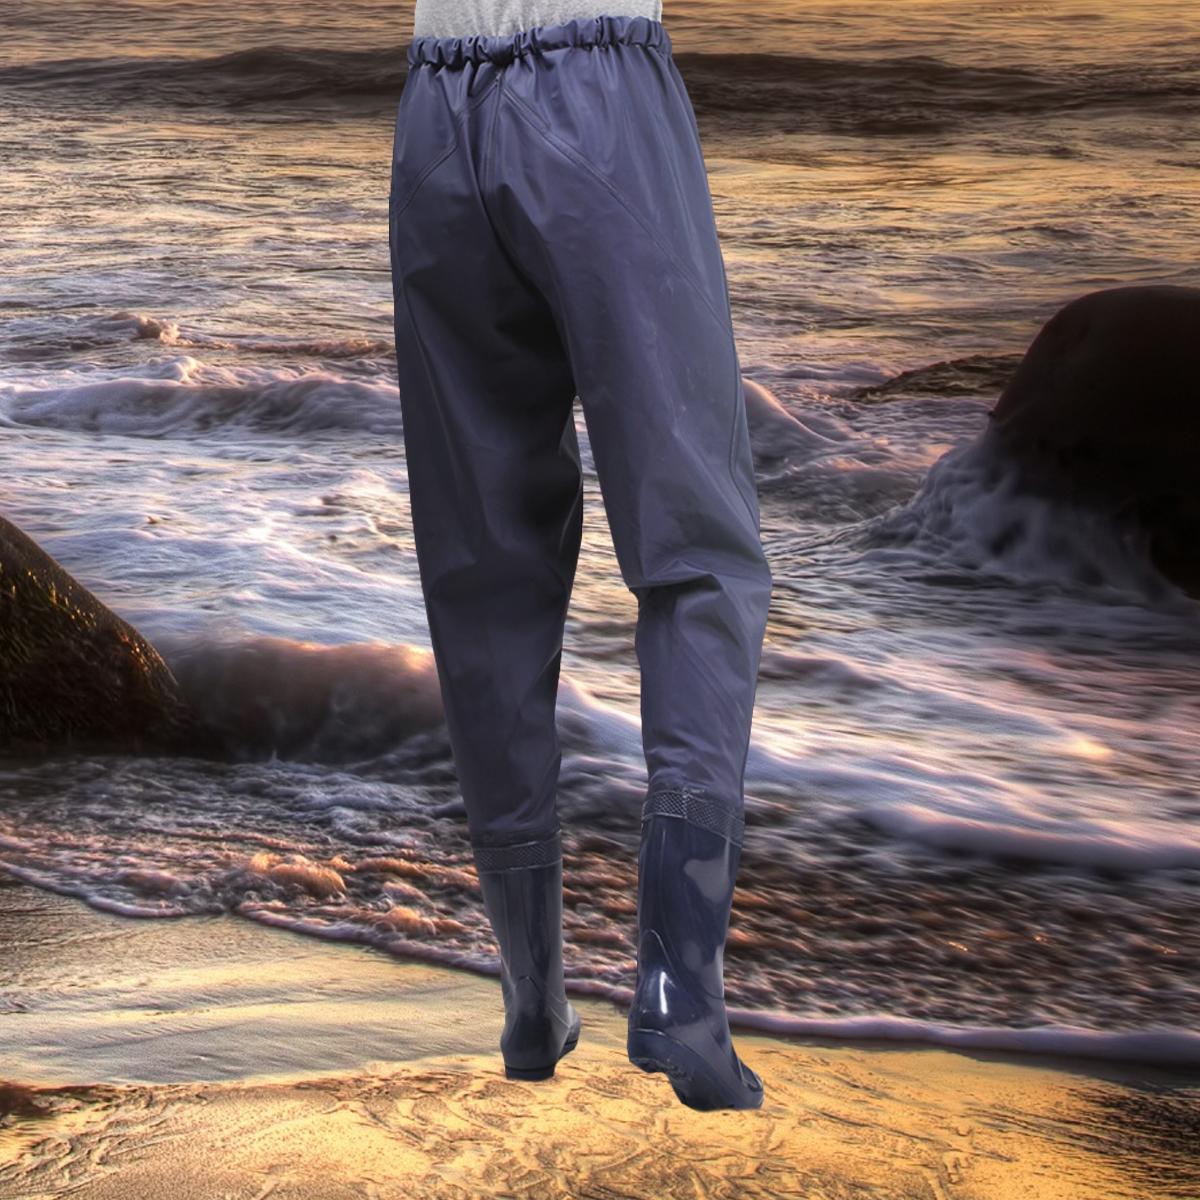 Waterproof Men Catch Fish Shoes Fishing Boot Outdoor Waist Wading Pants Overalls